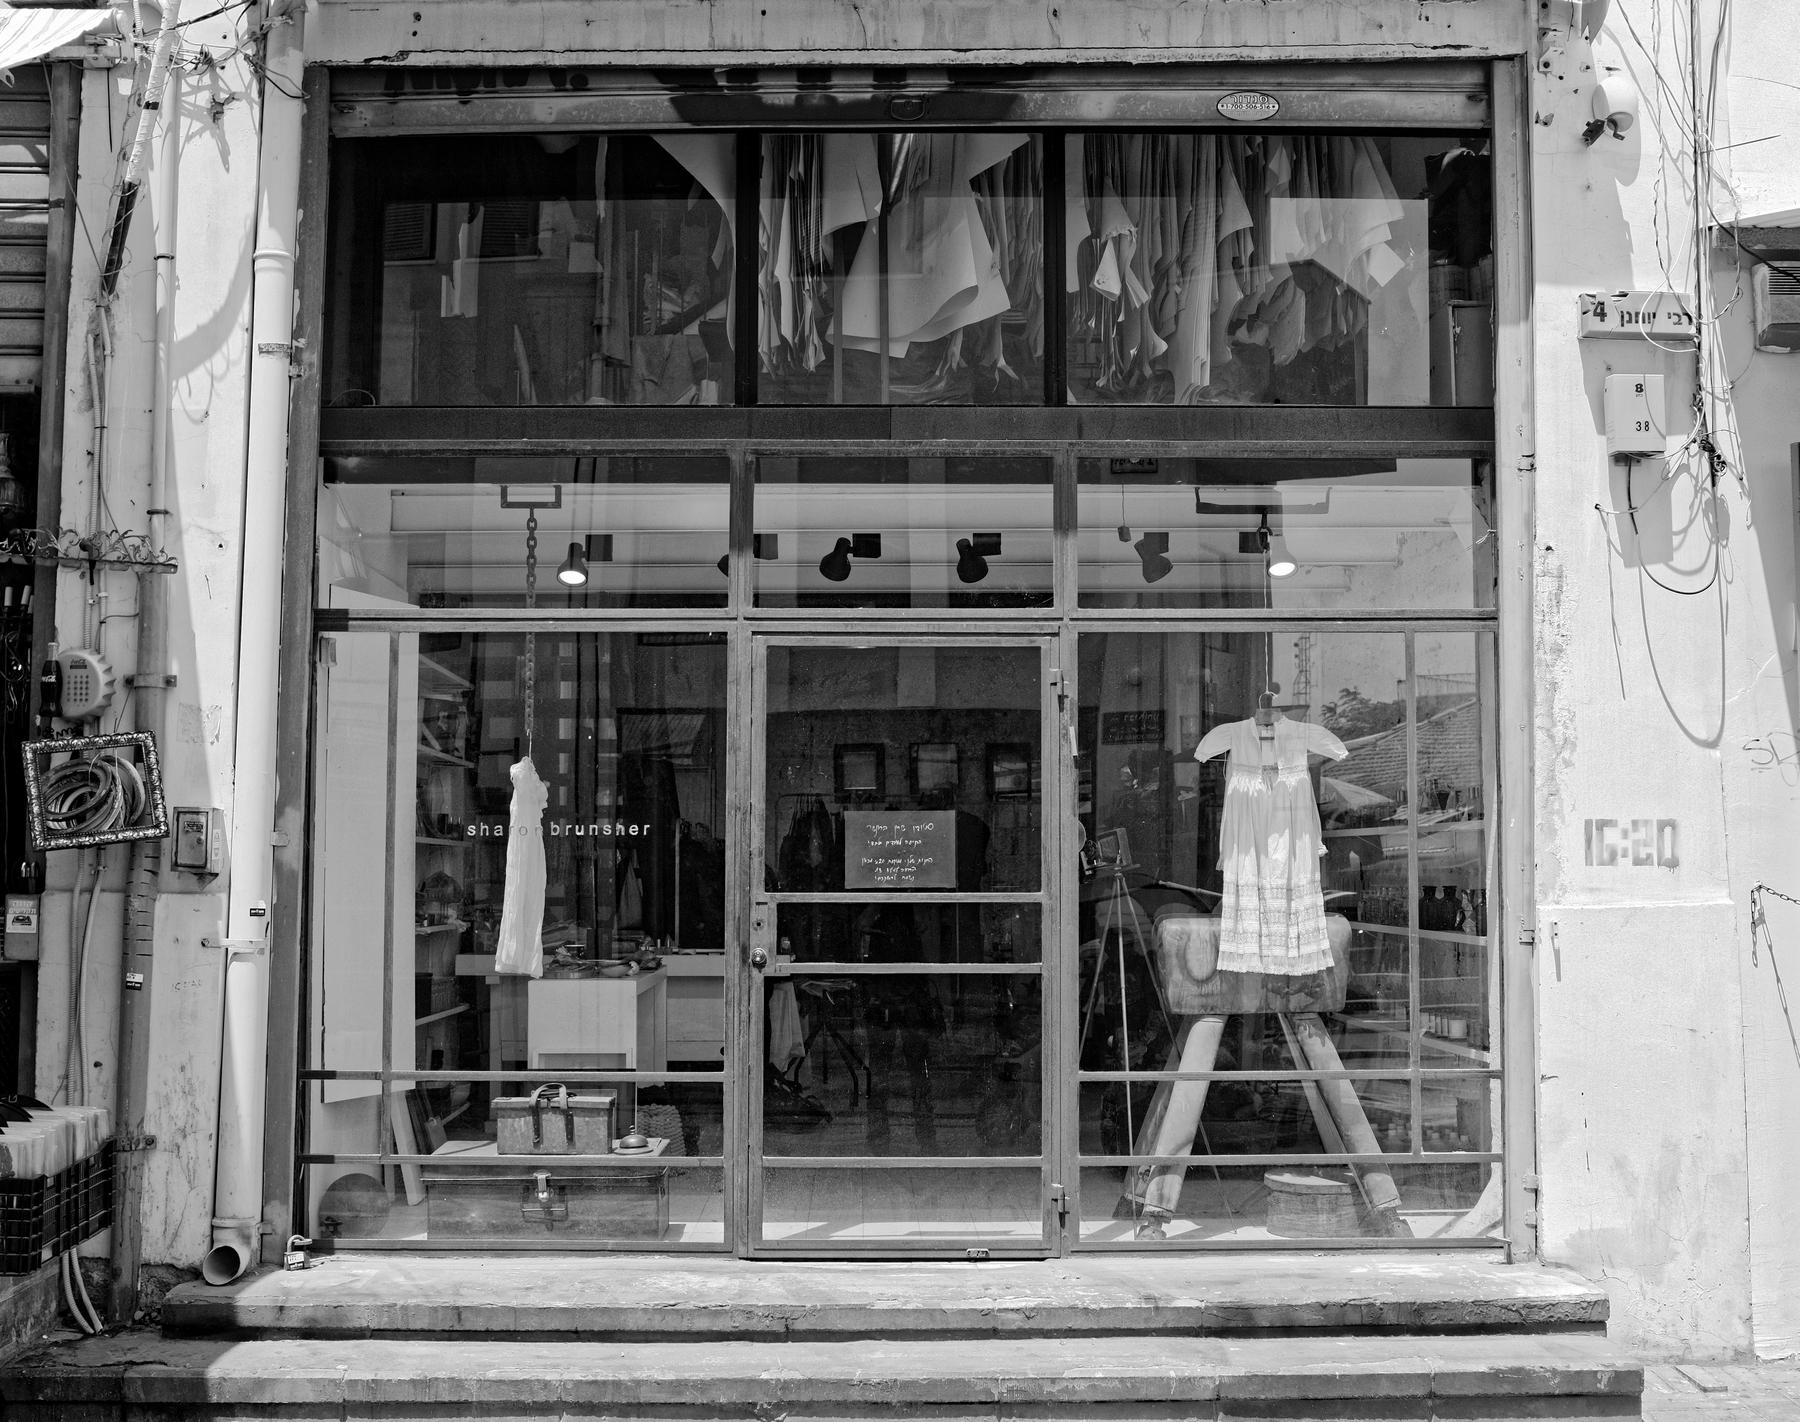 Haim_Blumenblat_Shopping Windows_Gowns_3.jpg